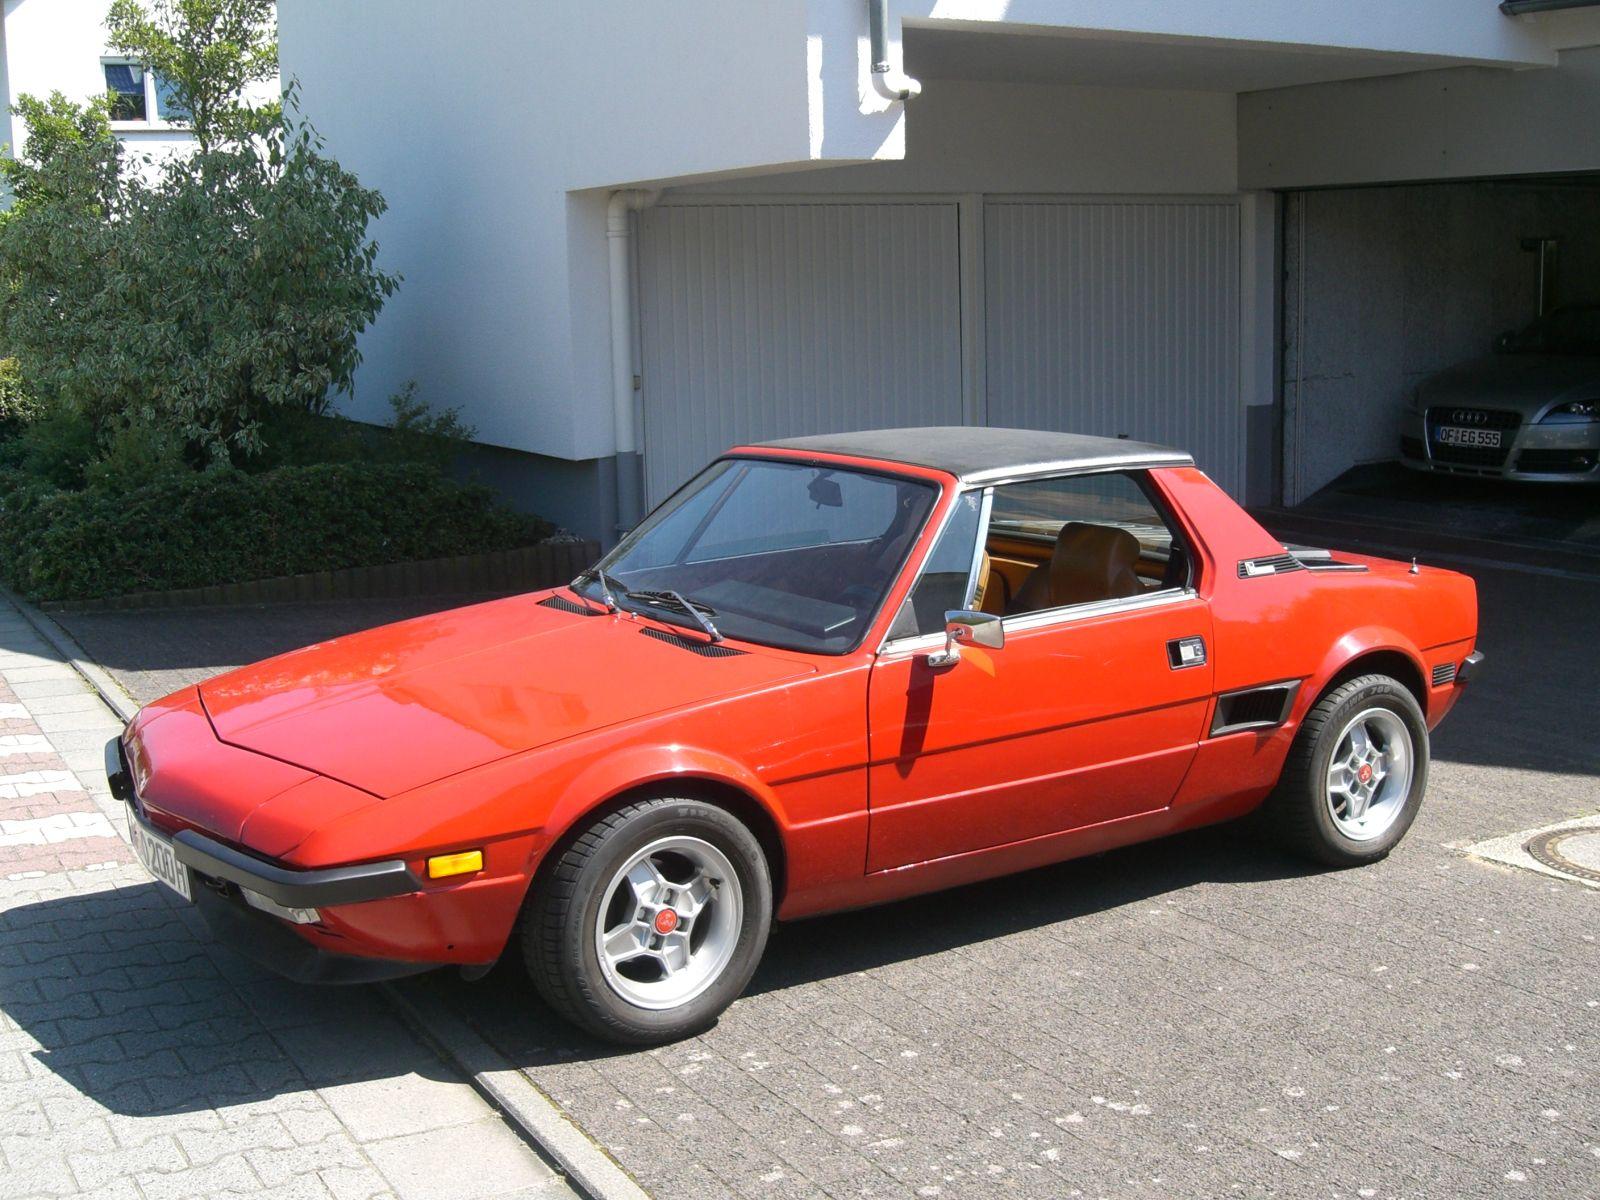 FIAT X19 / 78 | régiiskola | Pinterest | Fiat x19, Fiat and Cars